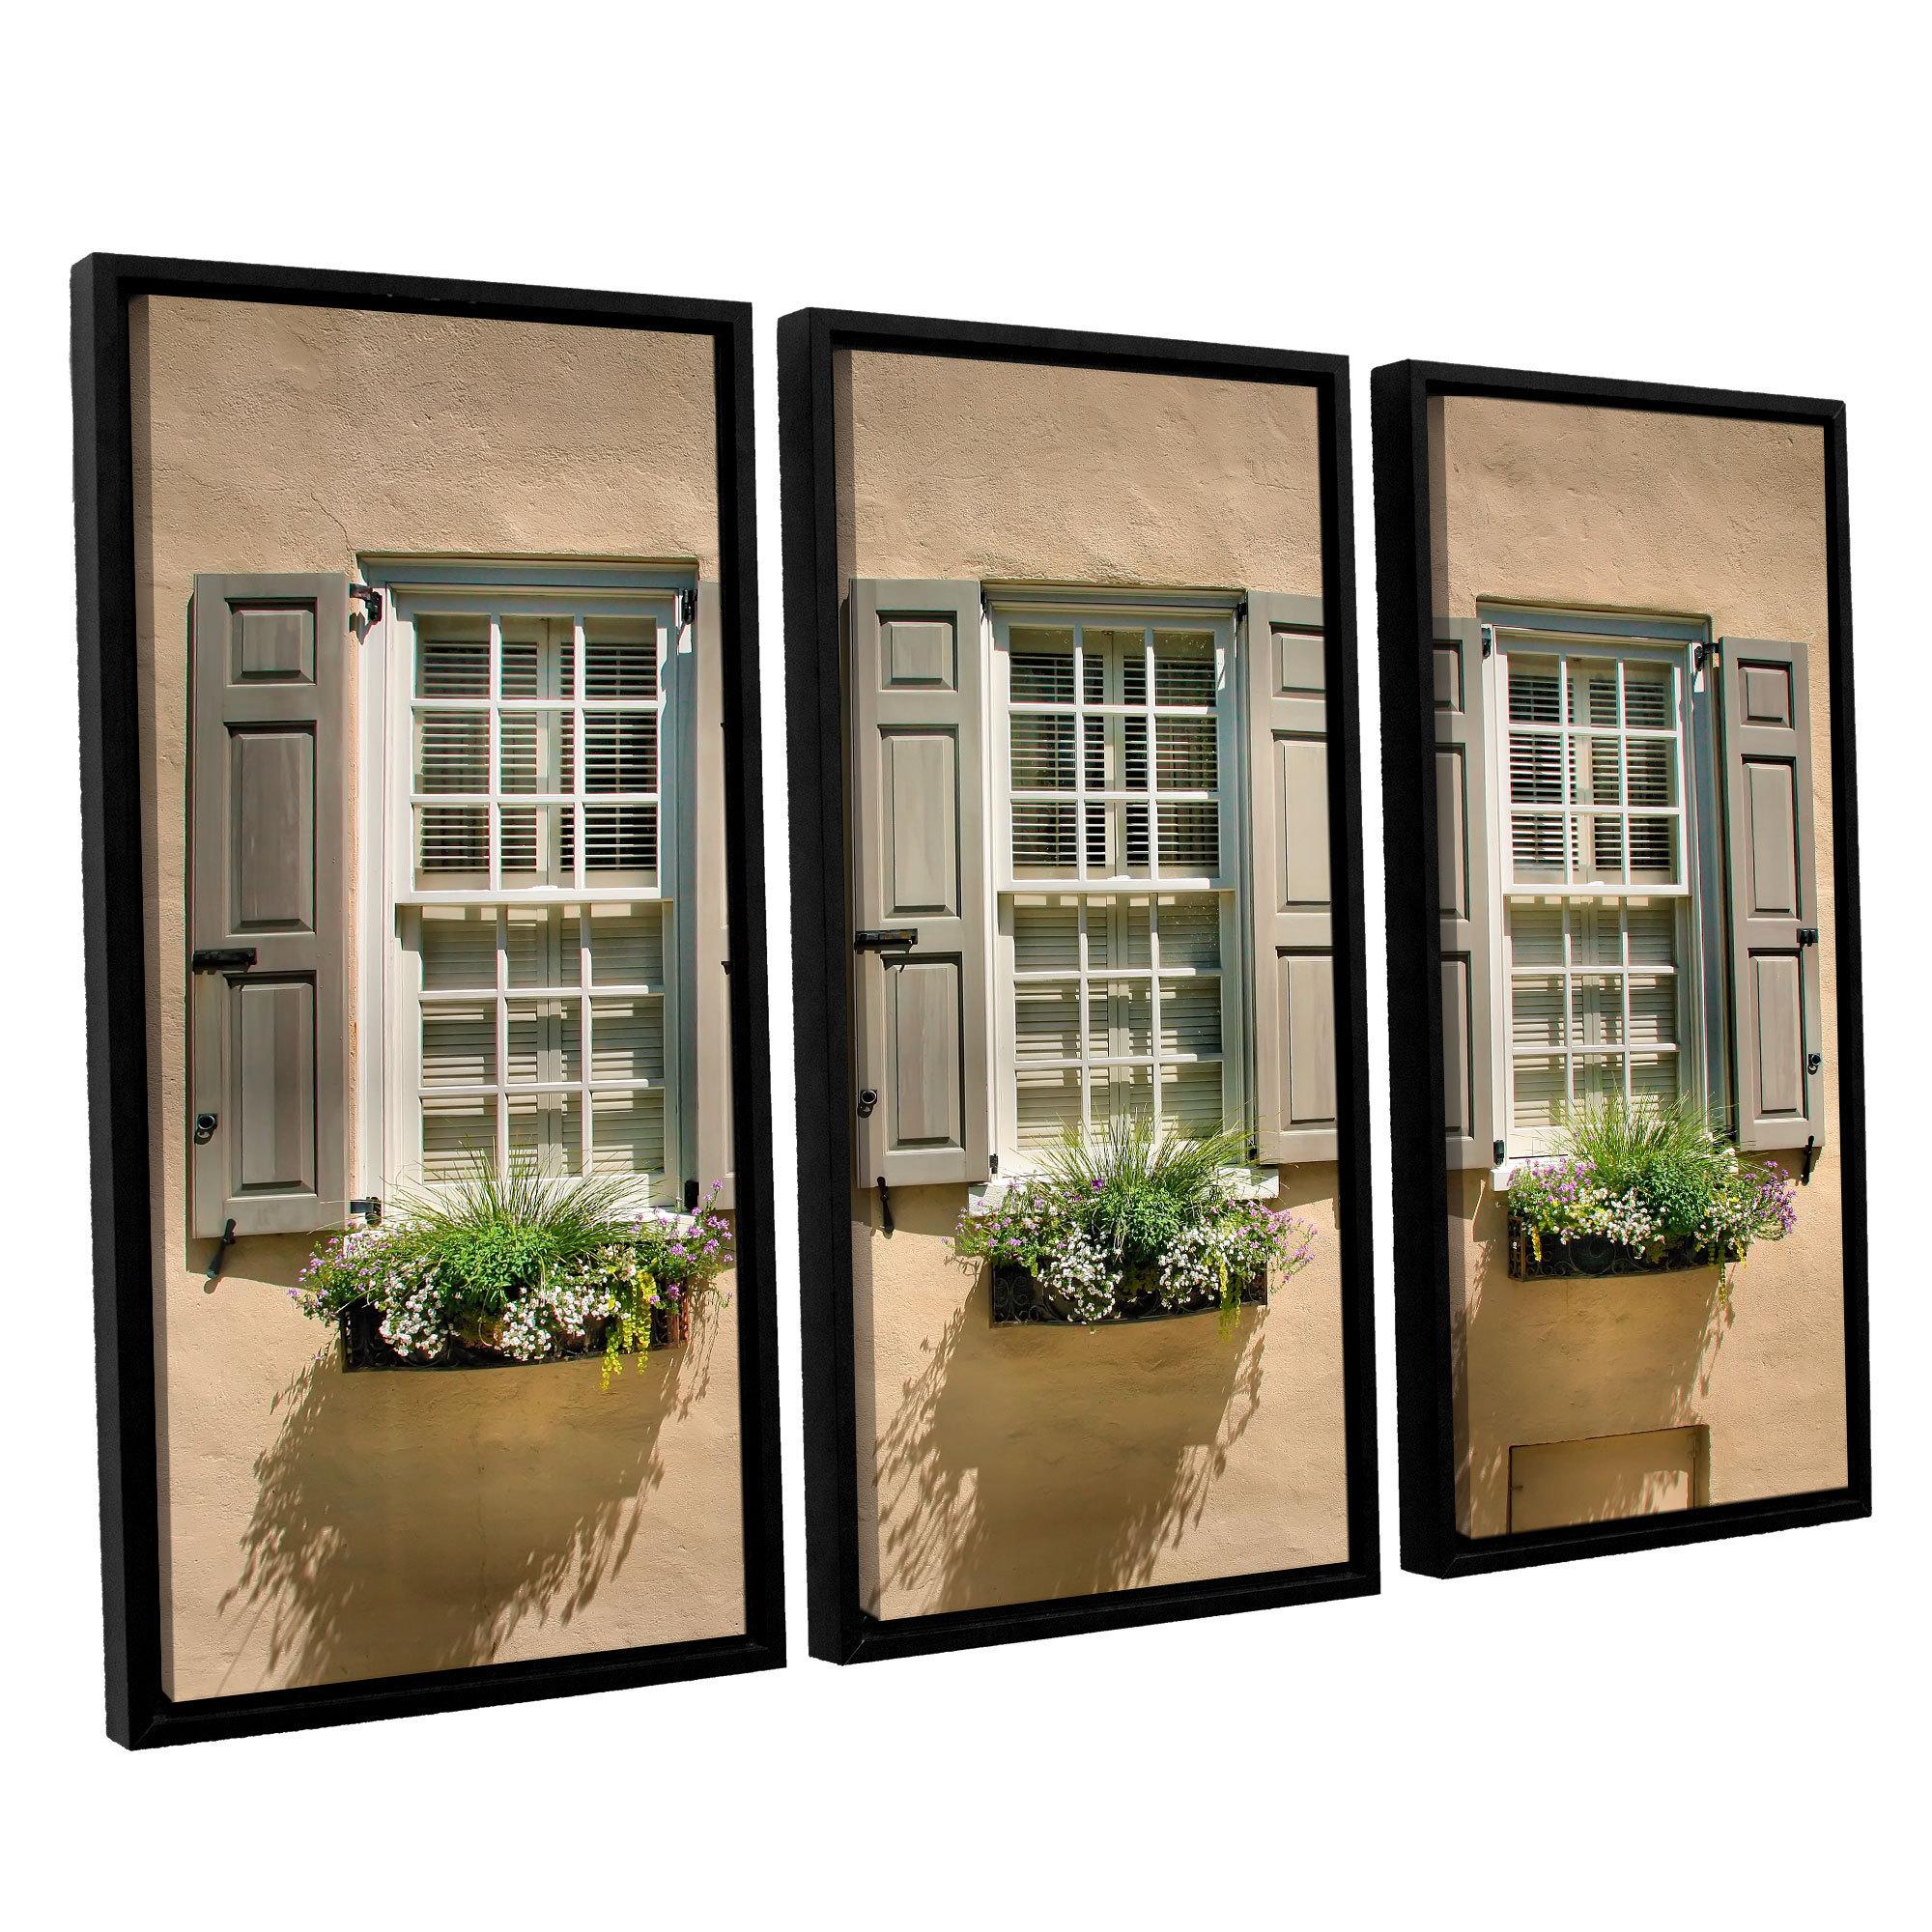 Artwall Steve Ainsworth Windows Of Old Charleston 3 Piece Floater Framed Canvas Set Multi Overstock 10431750